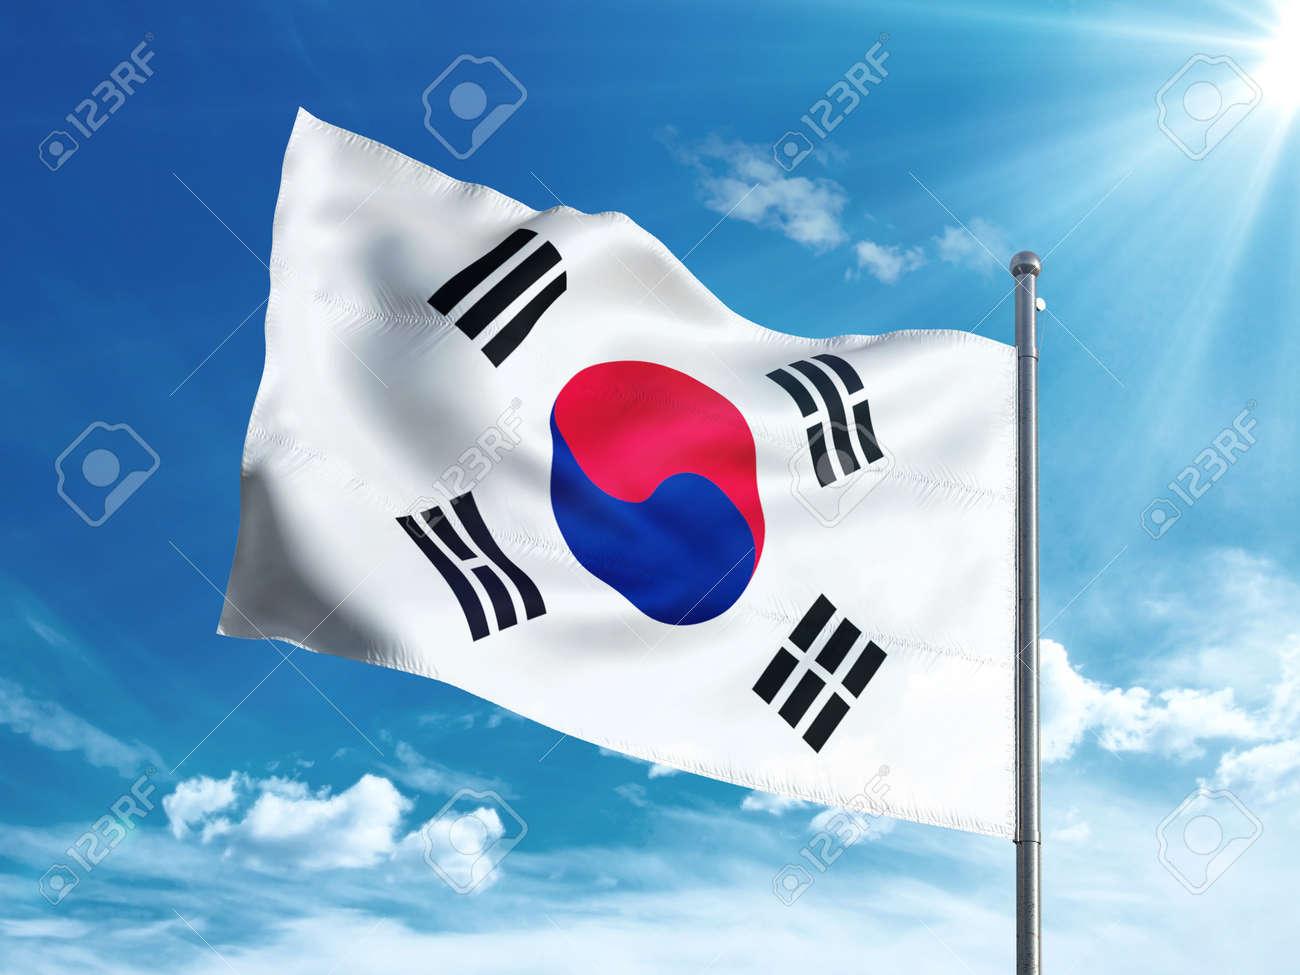 South Korea flag waving in the blue sky - 82792163